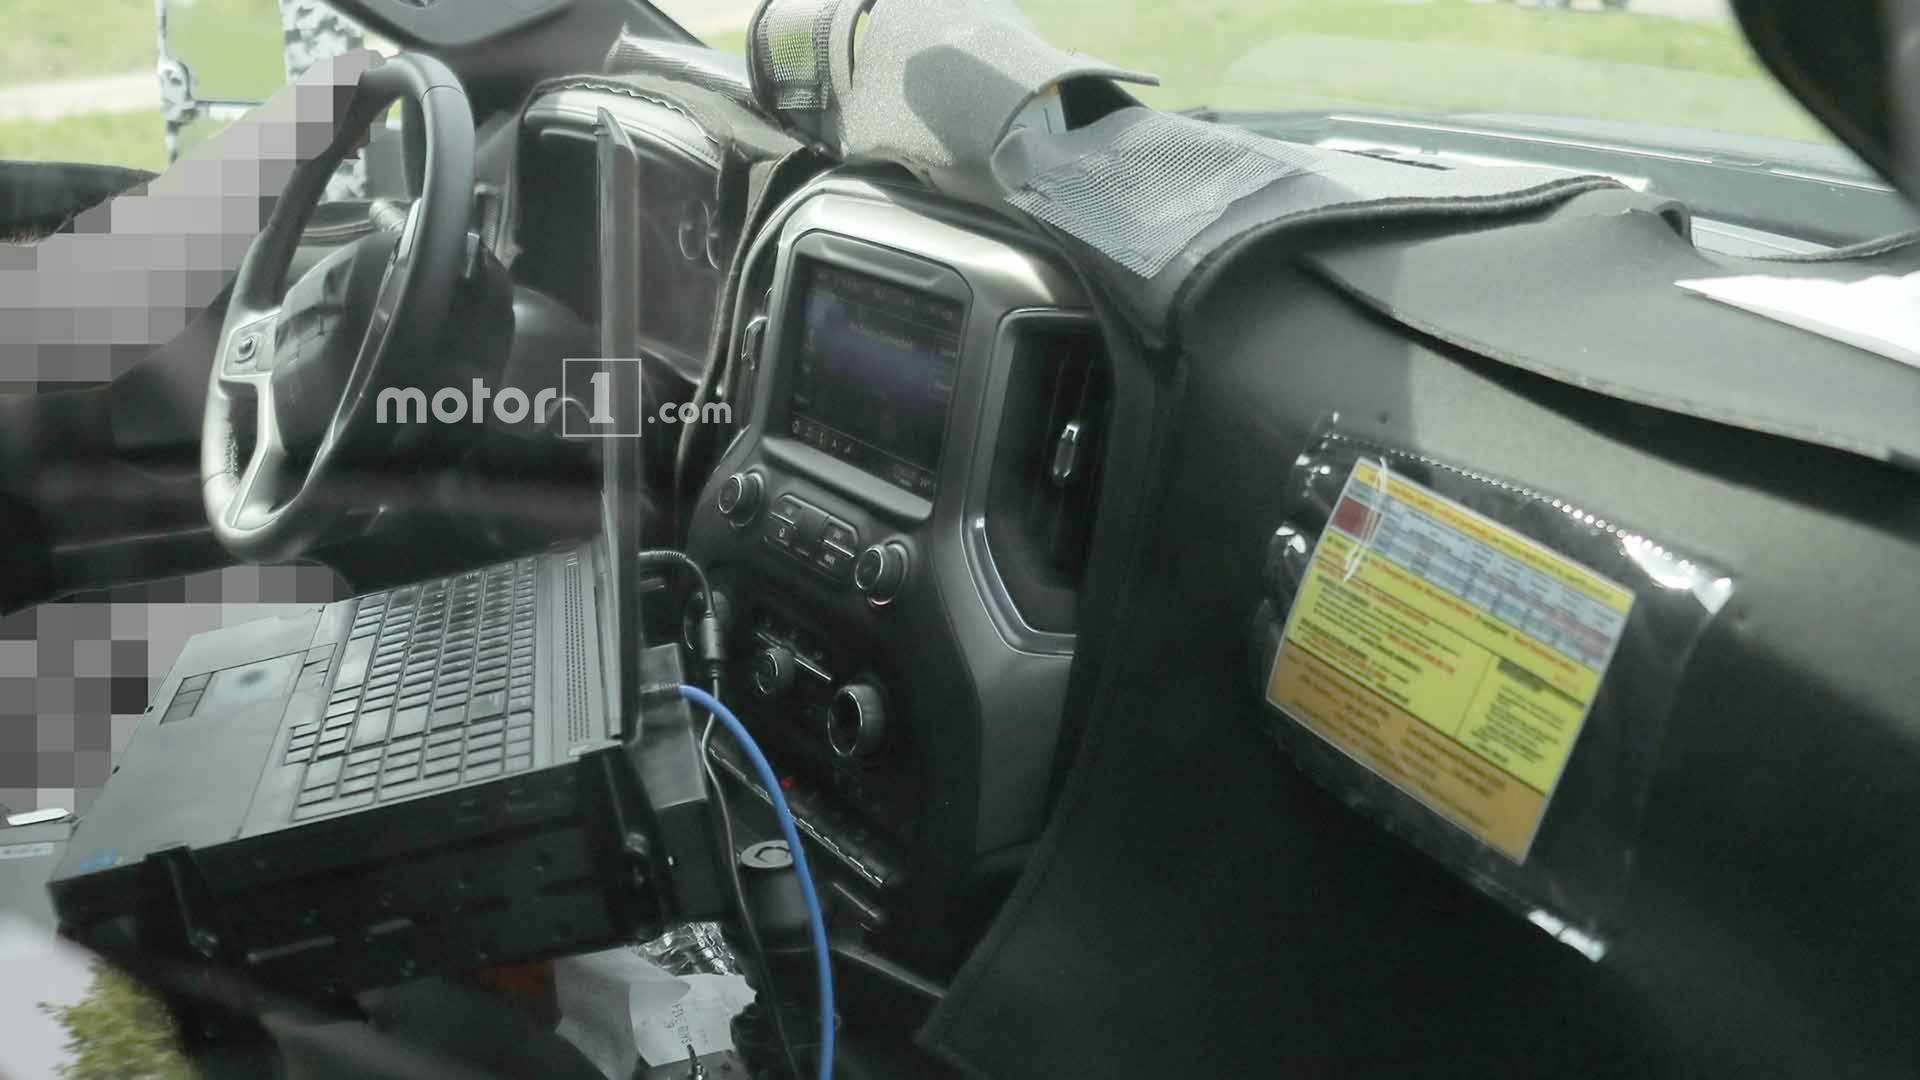 28 Great 2020 Chevrolet Hd Interior Rumors by 2020 Chevrolet Hd Interior